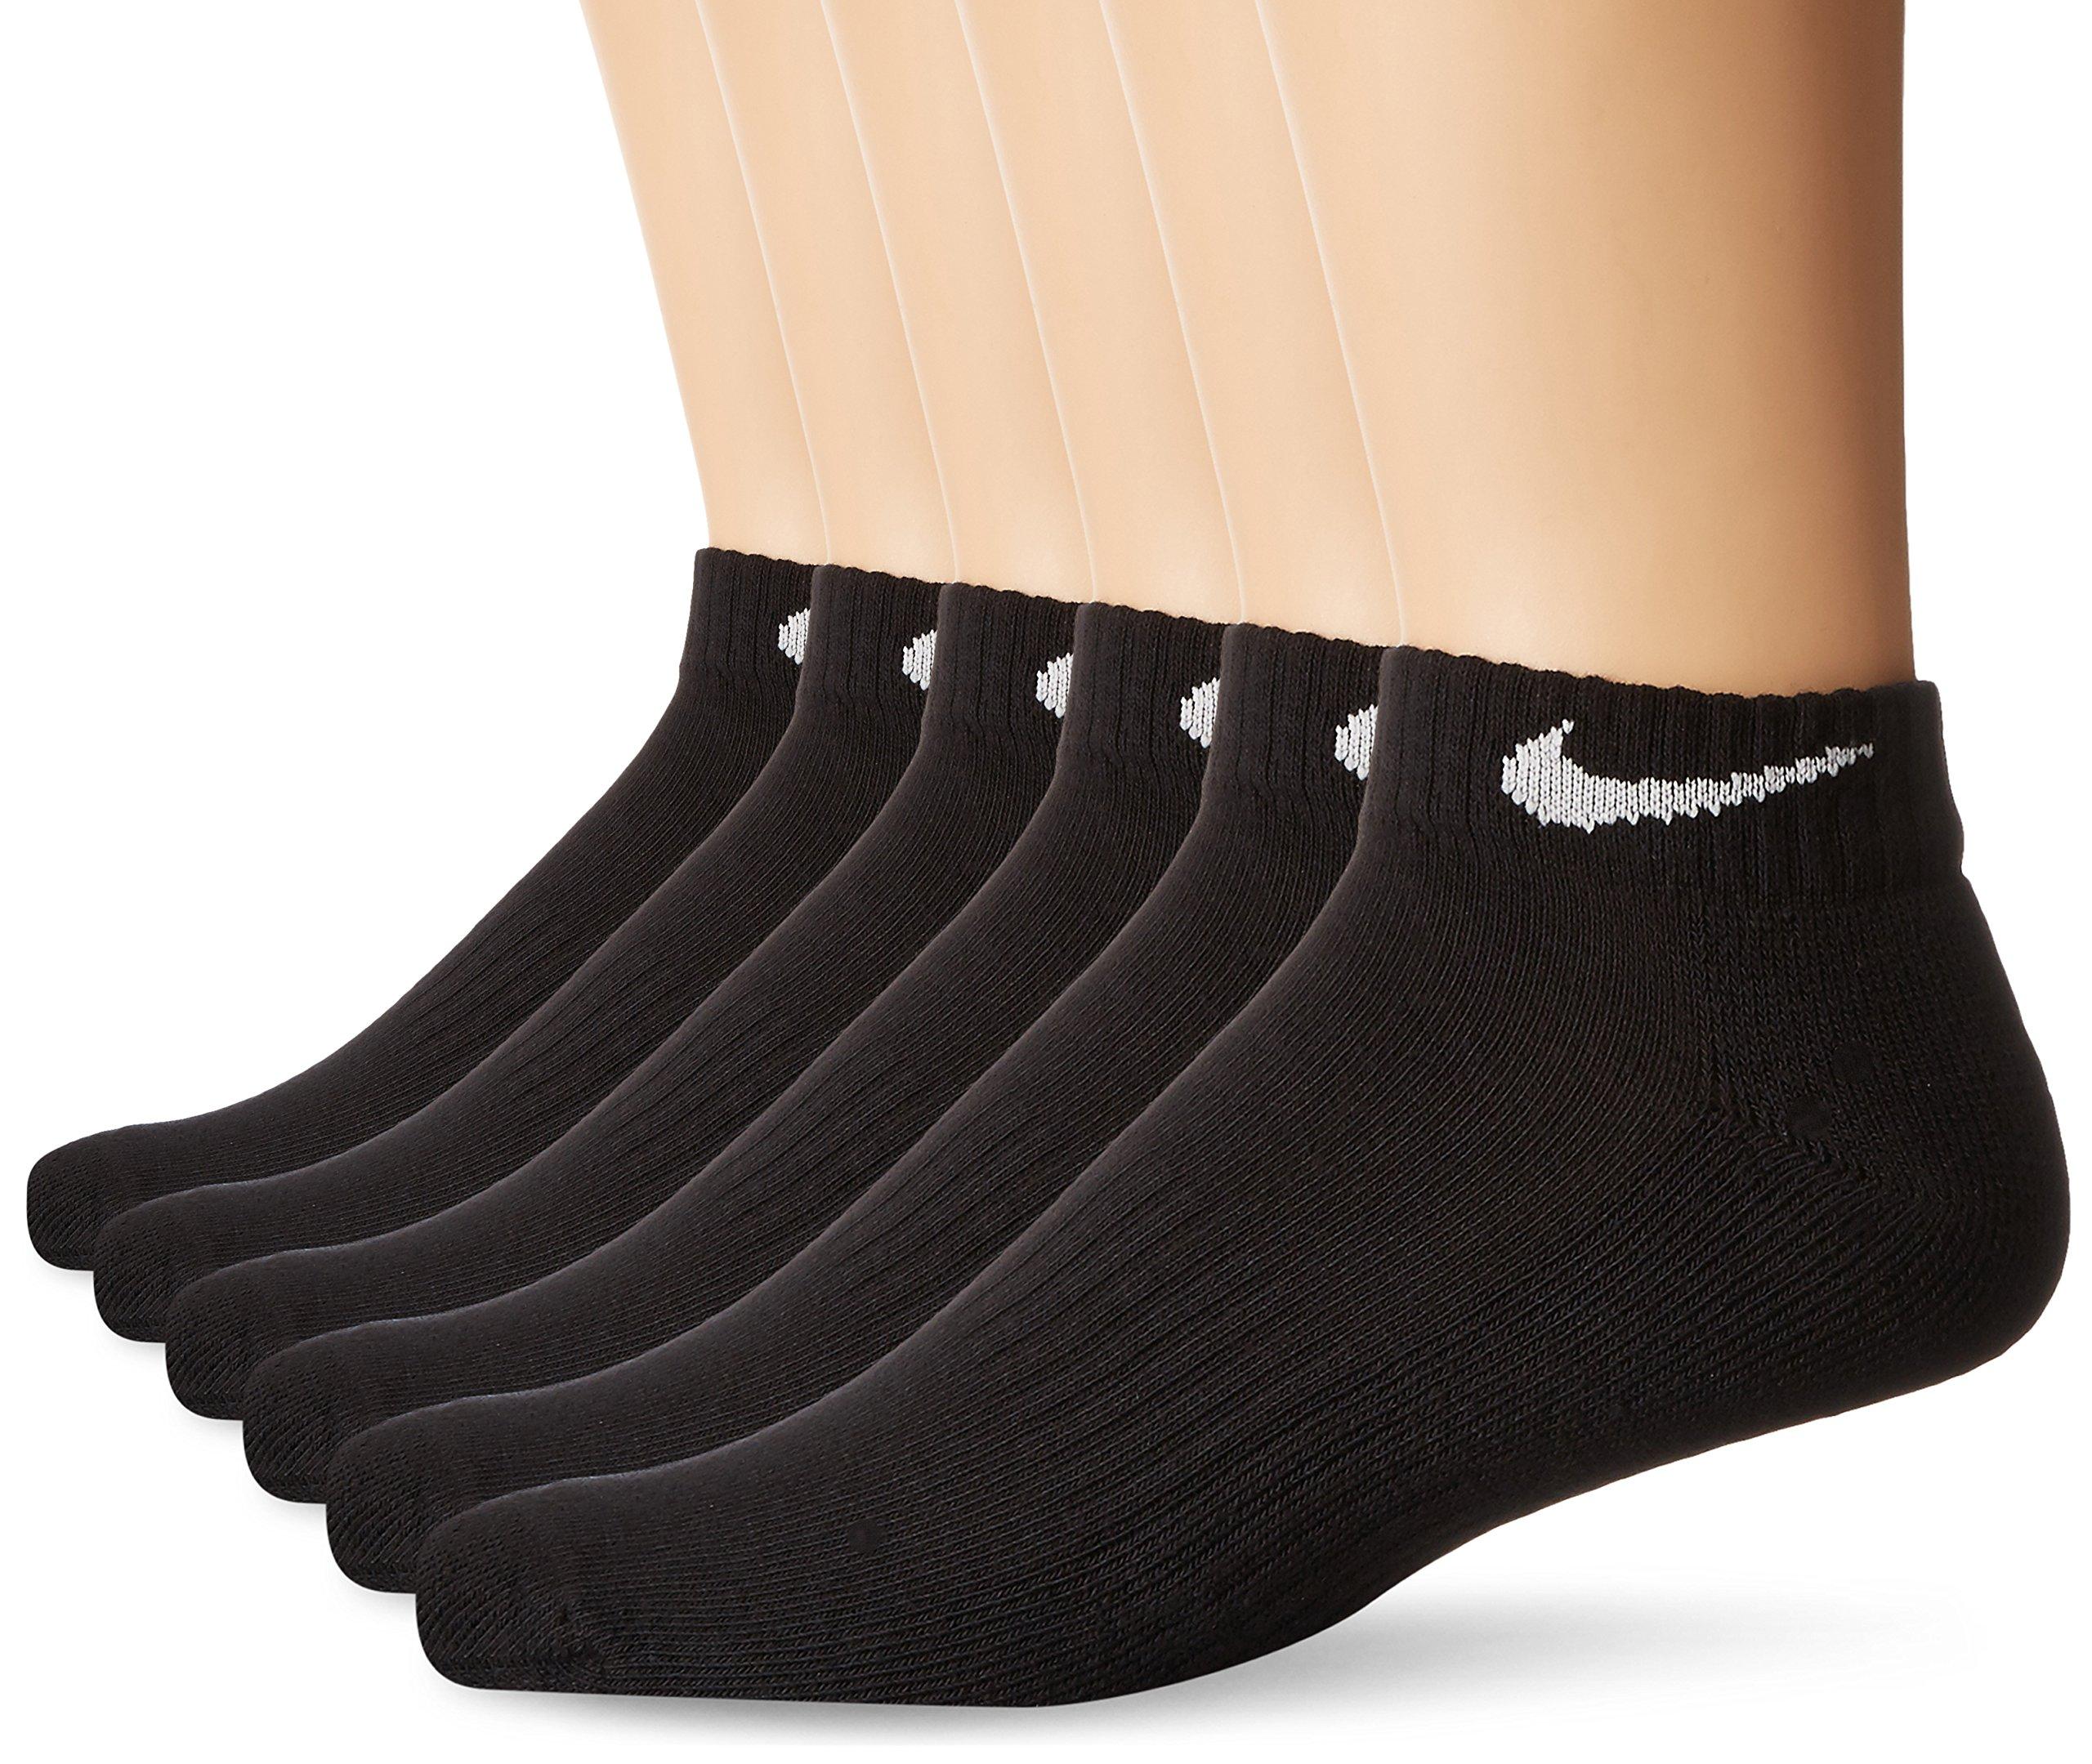 NIKE Unisex Performance Cushion Low Rise Socks with Band (6 Pairs), Black/White, Medium by Nike